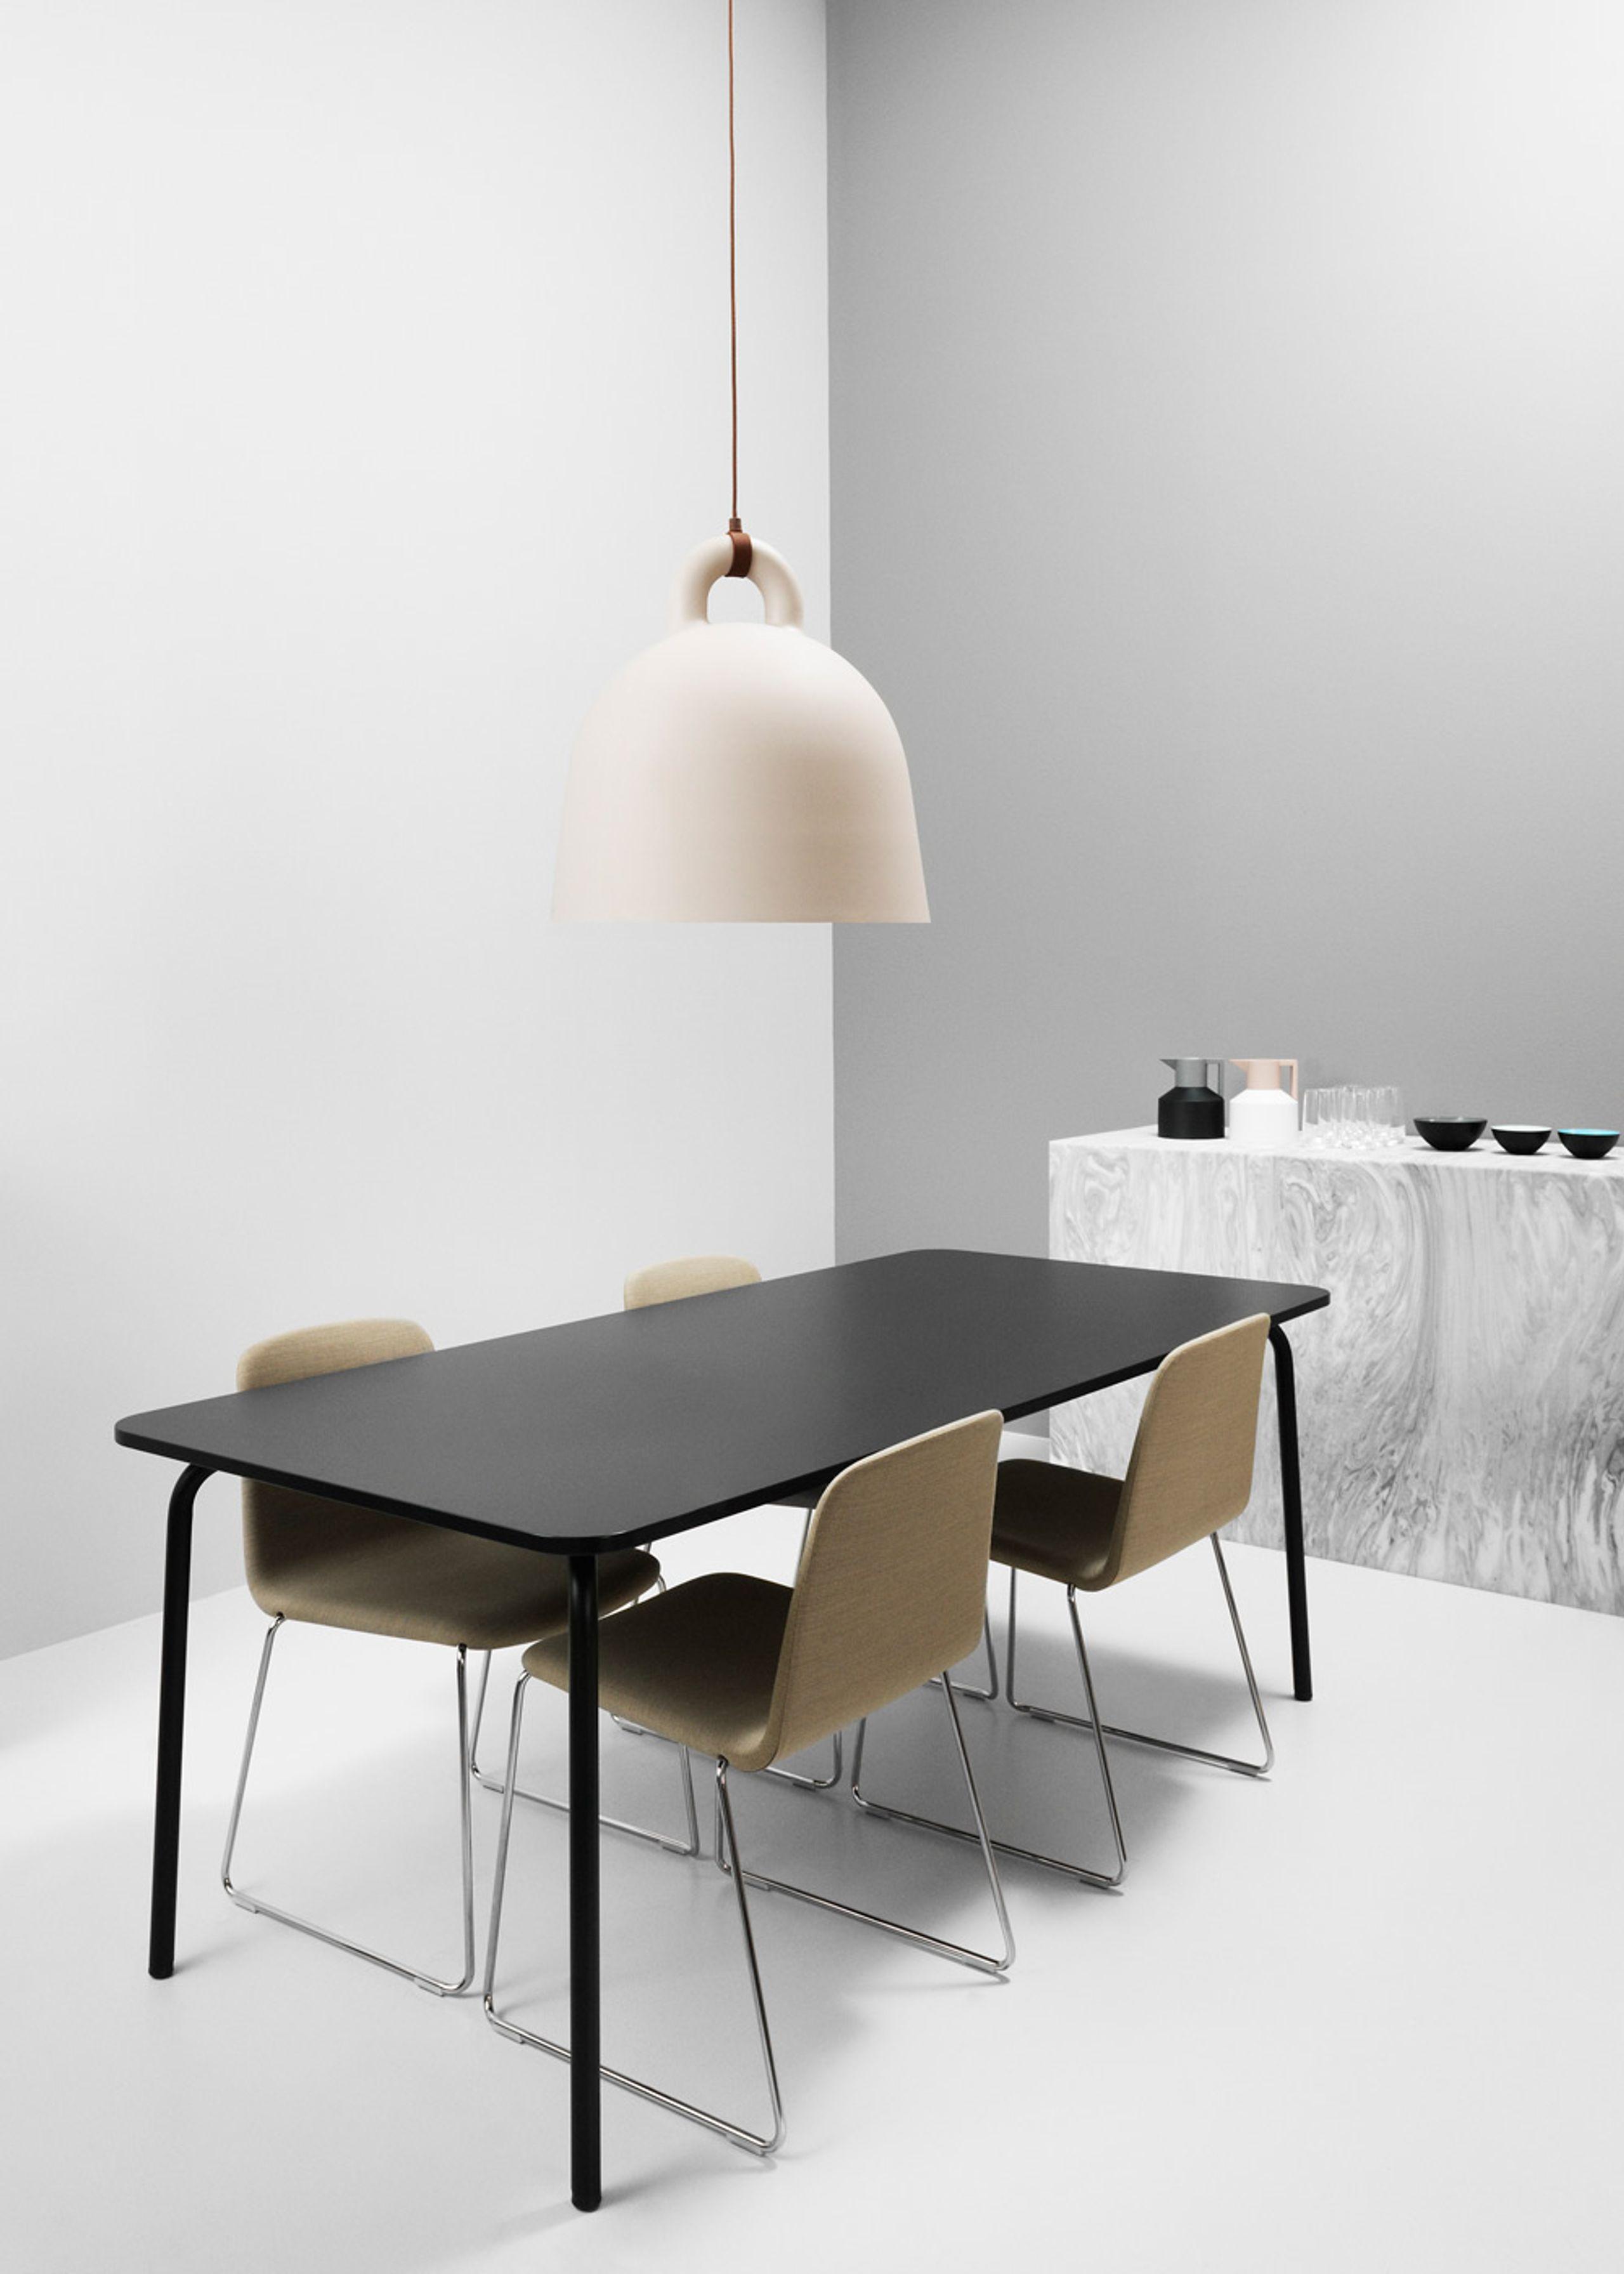 bell lampe normann copenhagen. Black Bedroom Furniture Sets. Home Design Ideas